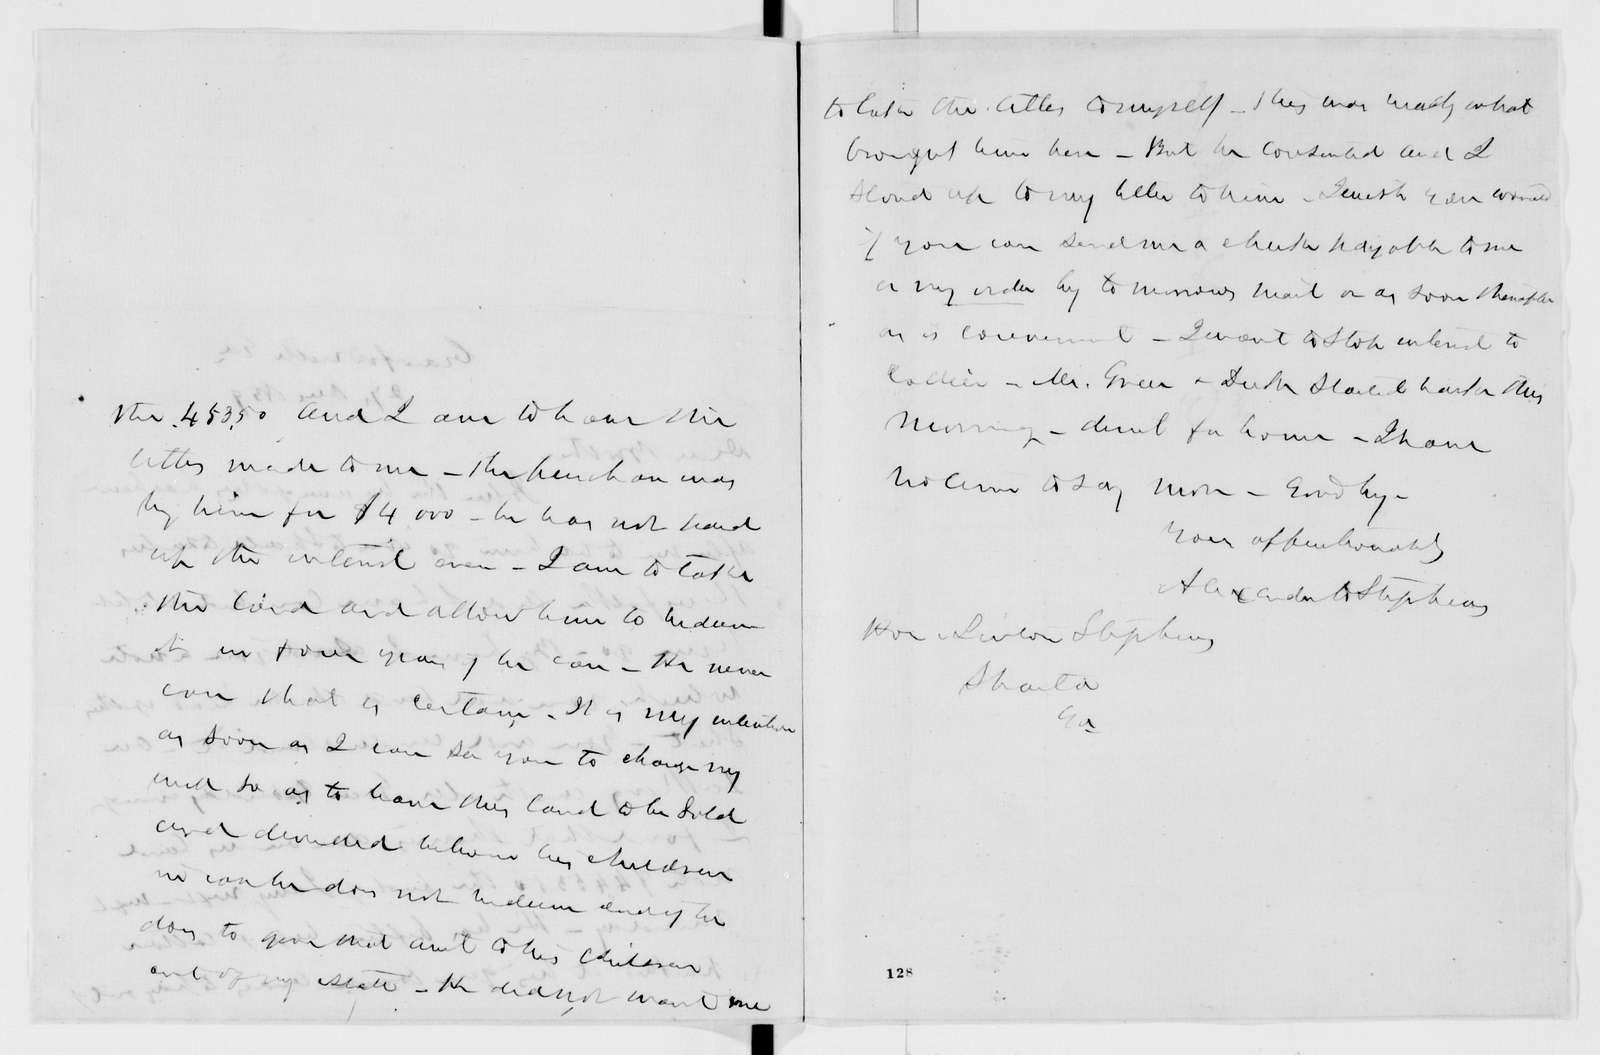 Alexander Hamilton Stephens Papers: General Correspondence, 1784-1886; 1859, Oct. 25-1860, Mar. 4